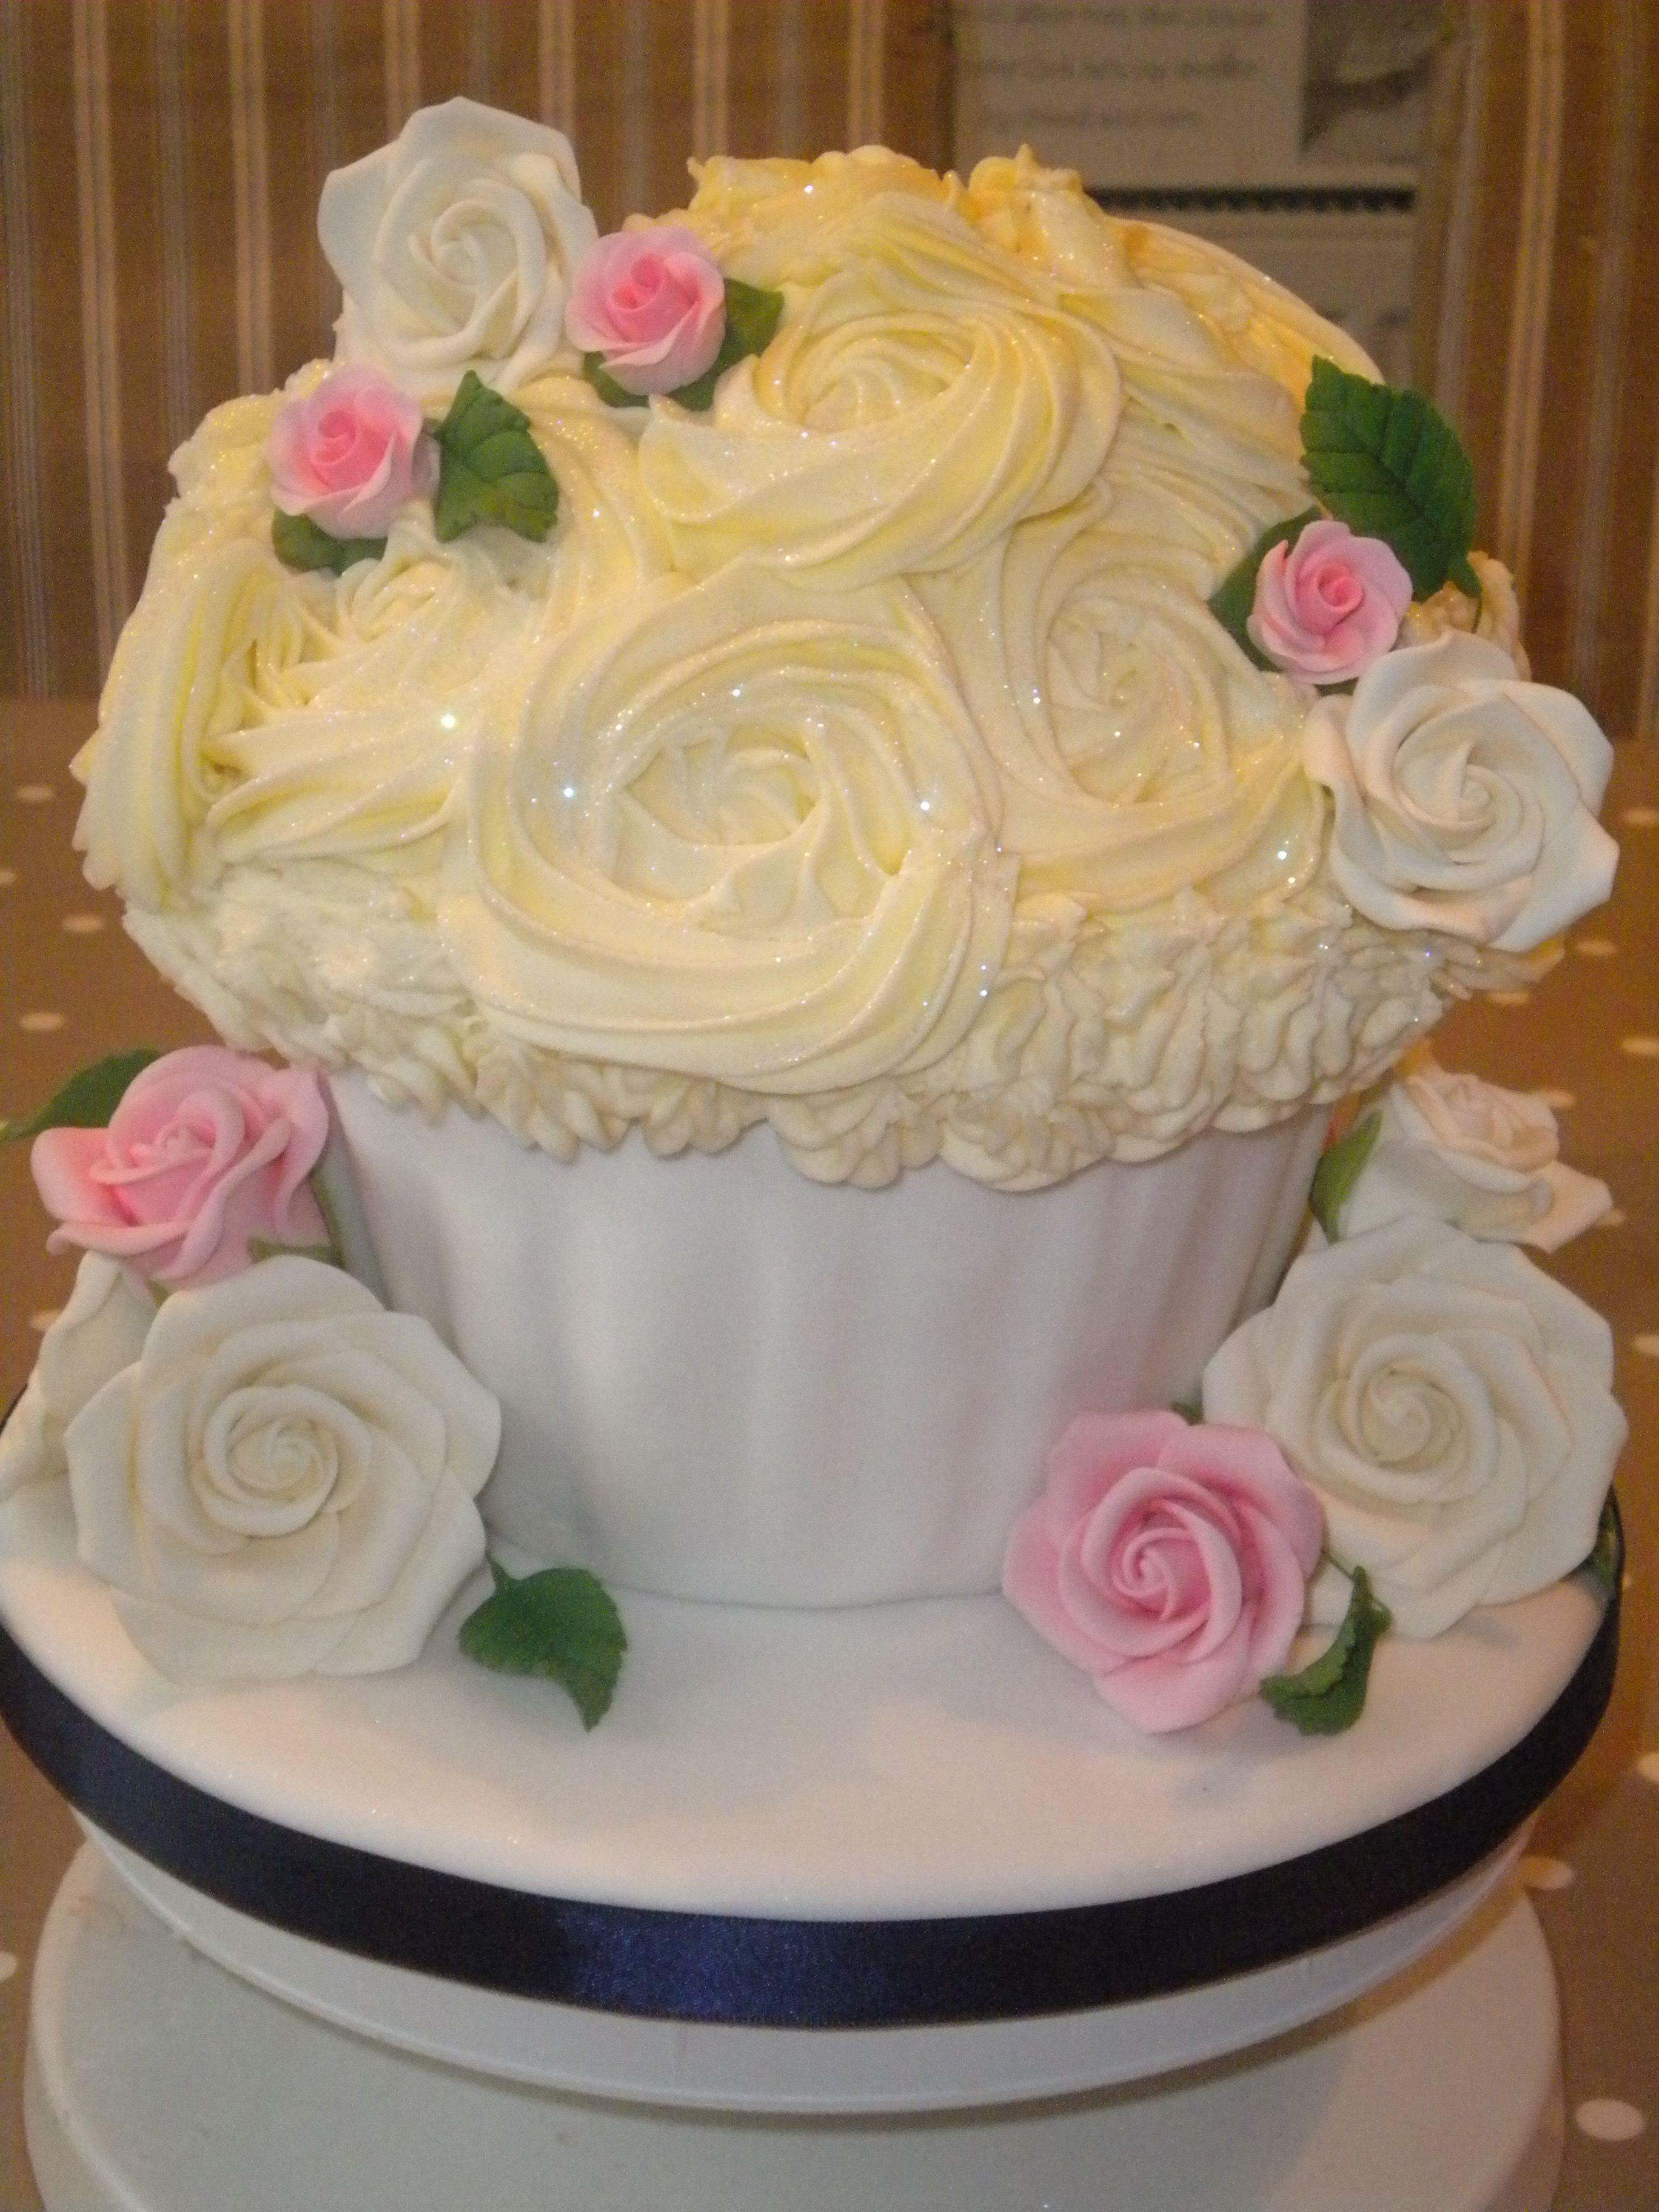 Giant wedding cupcake | cool cakes in 2018 | Pinterest | Wedding ...